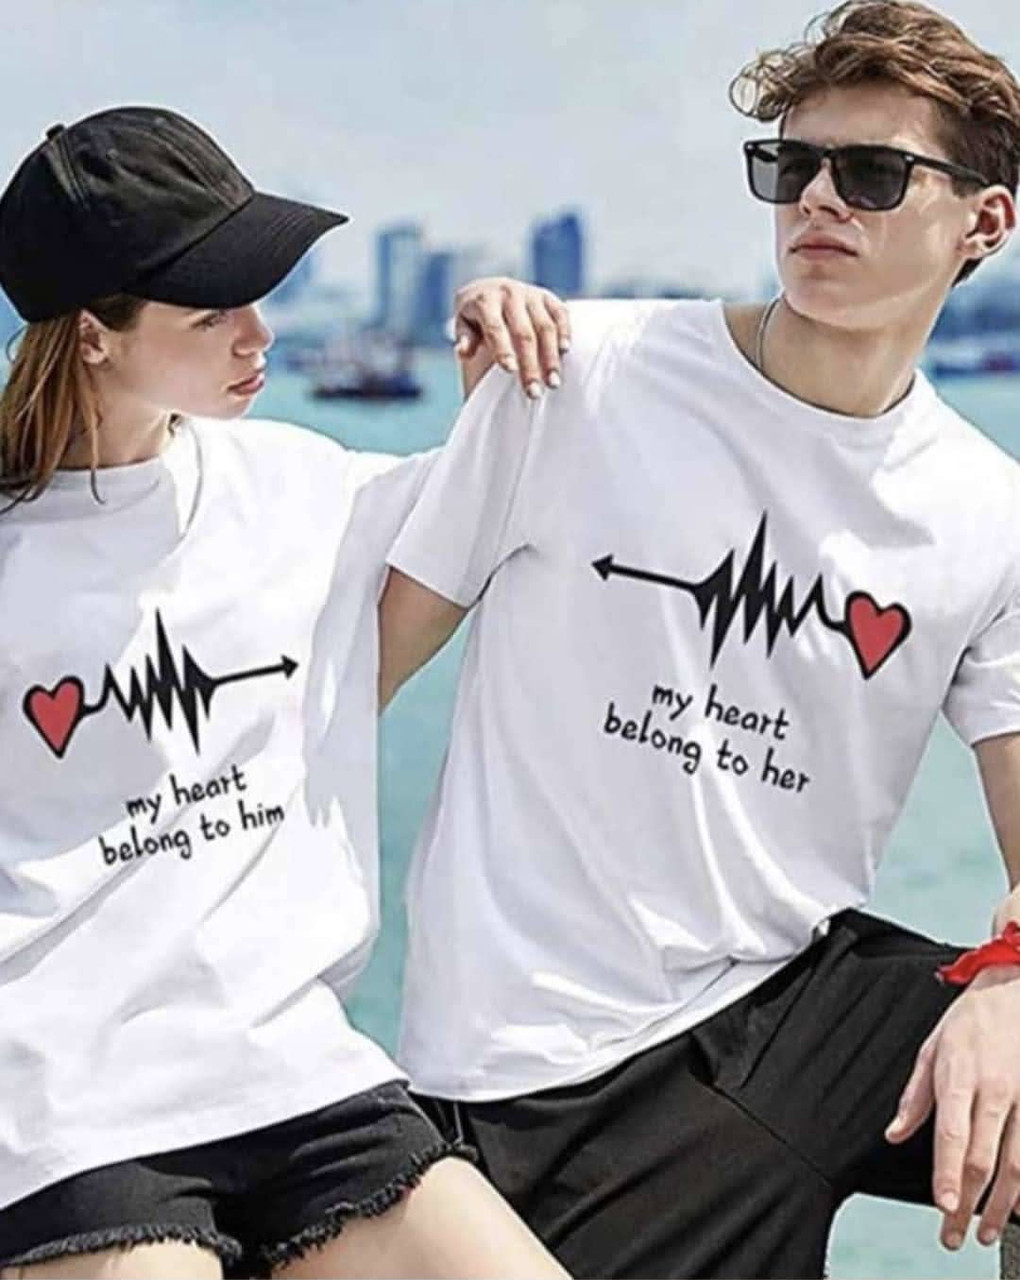 Парные футболки для влюбленных (цена указана за пару футболок)